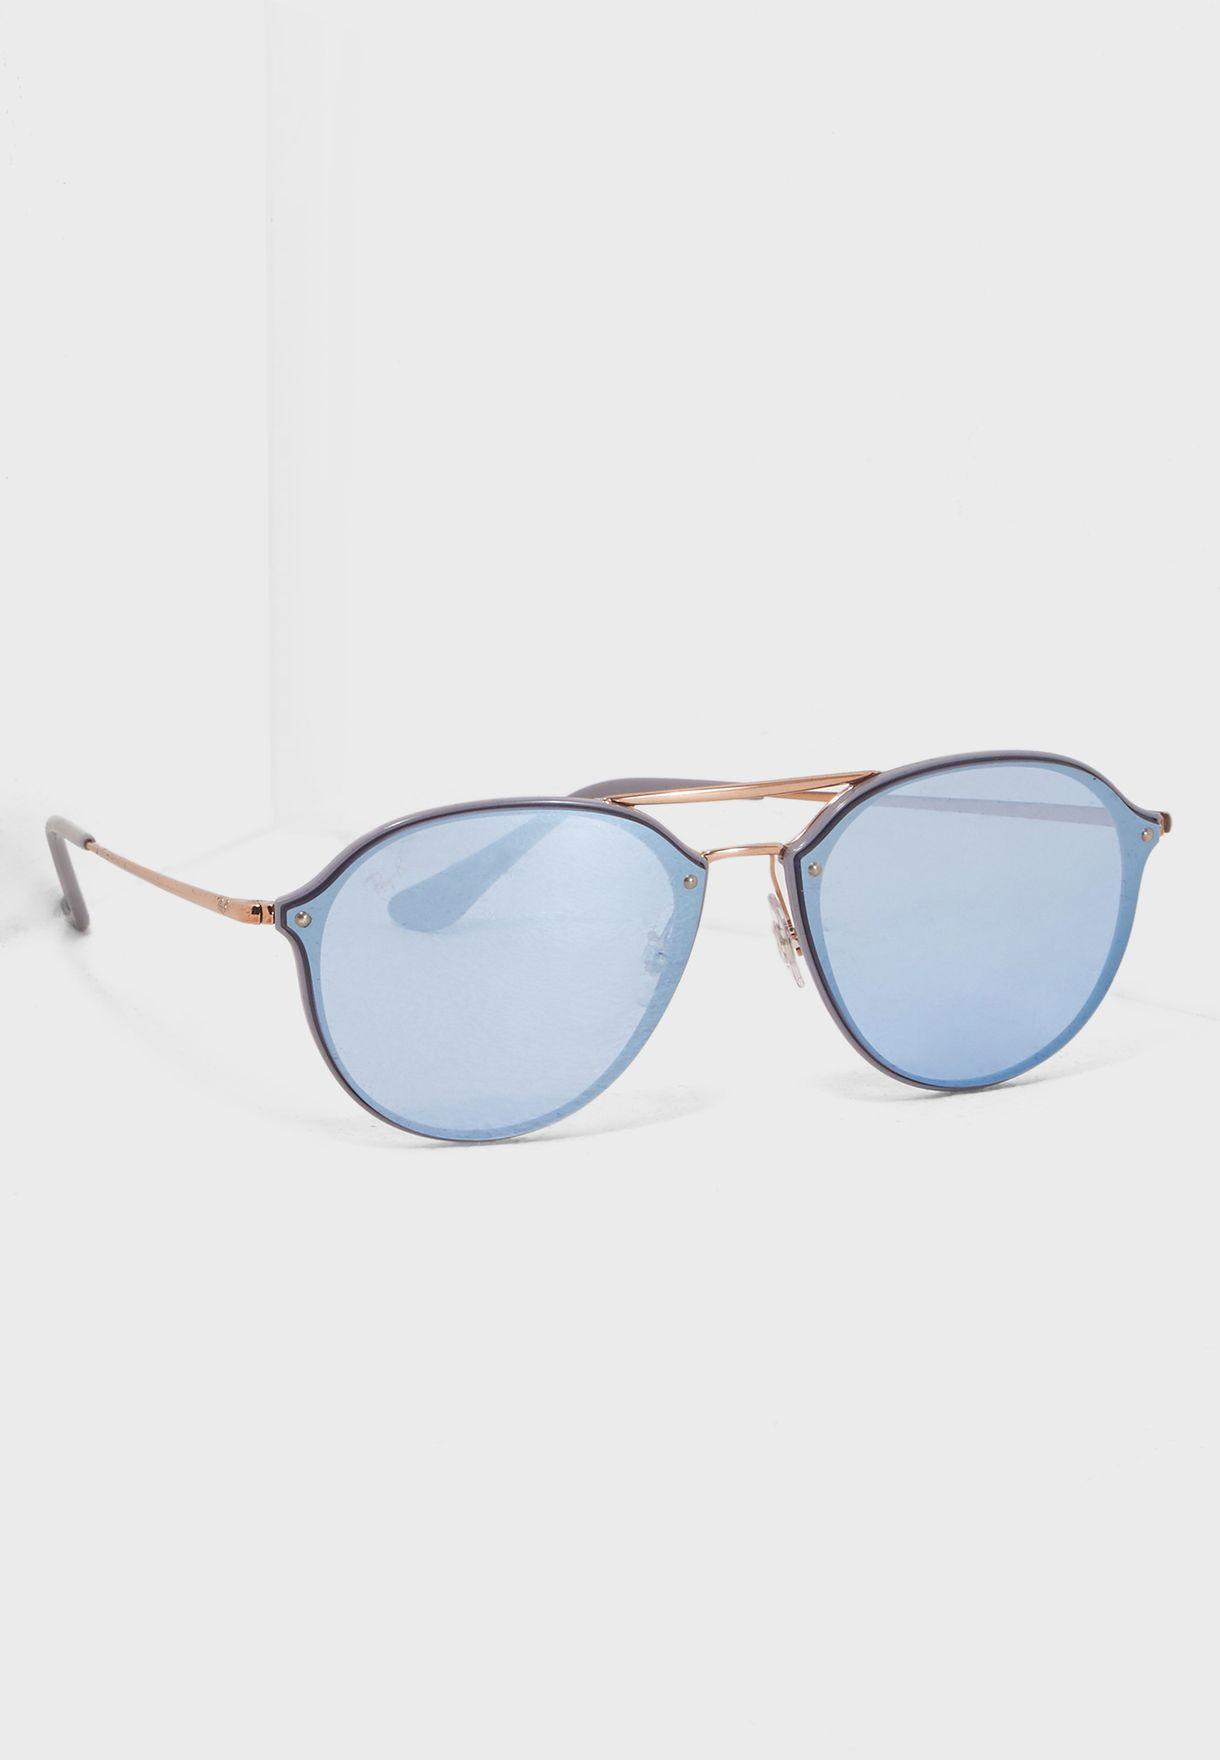 137b9893e تسوق نظارة شمسية دبل بريدج ماركة ريبان لون رمادي 8053672837902 في ...